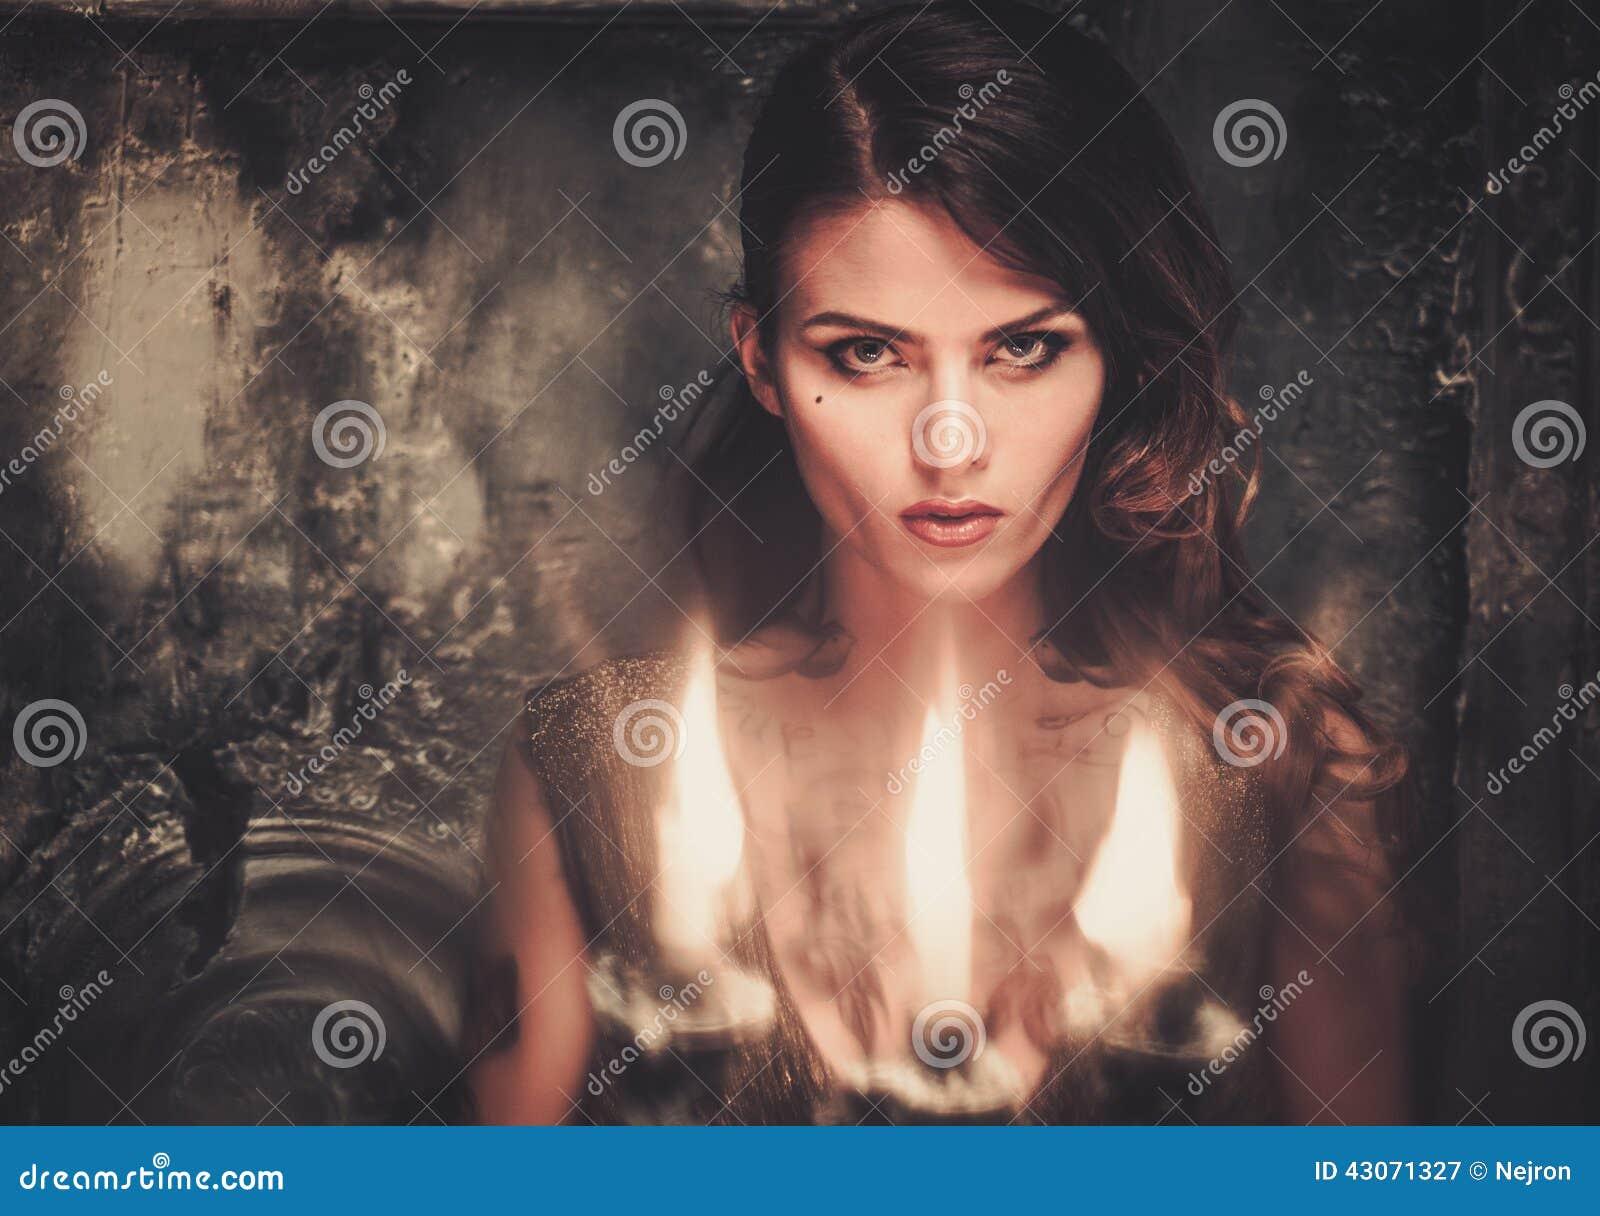 Mujer tatuada en interior fantasmagórico